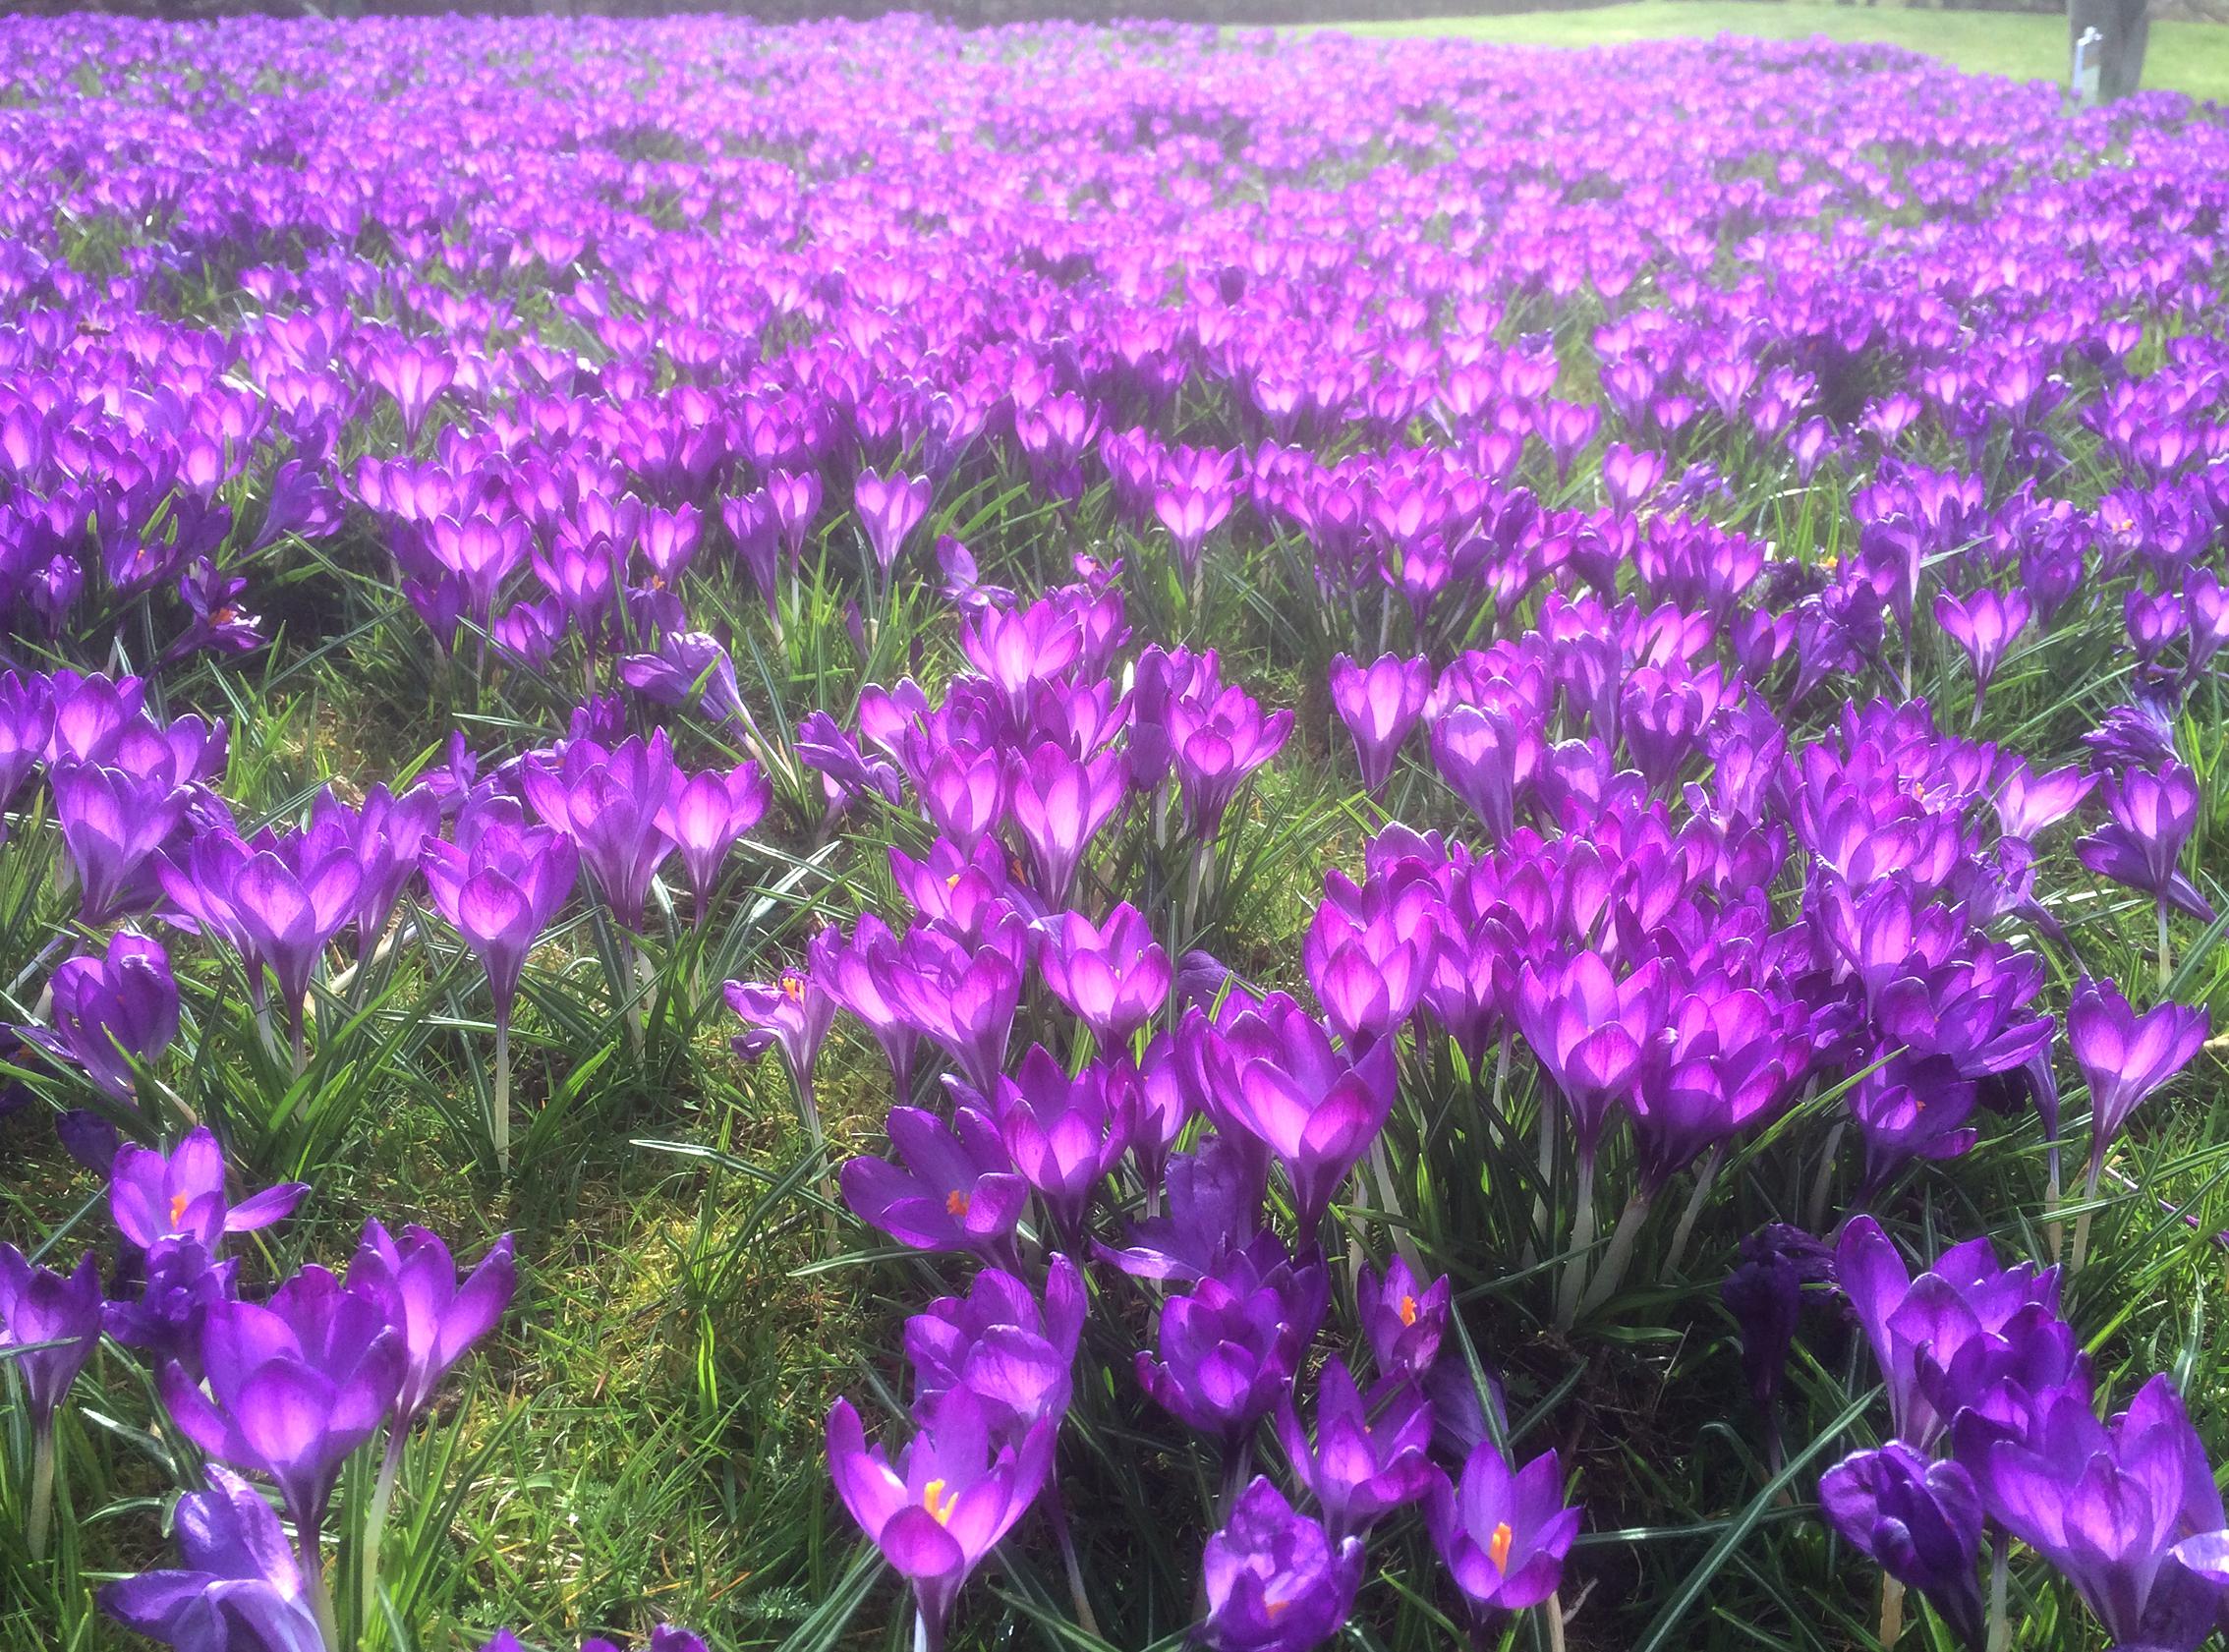 Photograph of a beautiful sea of purple crocuses